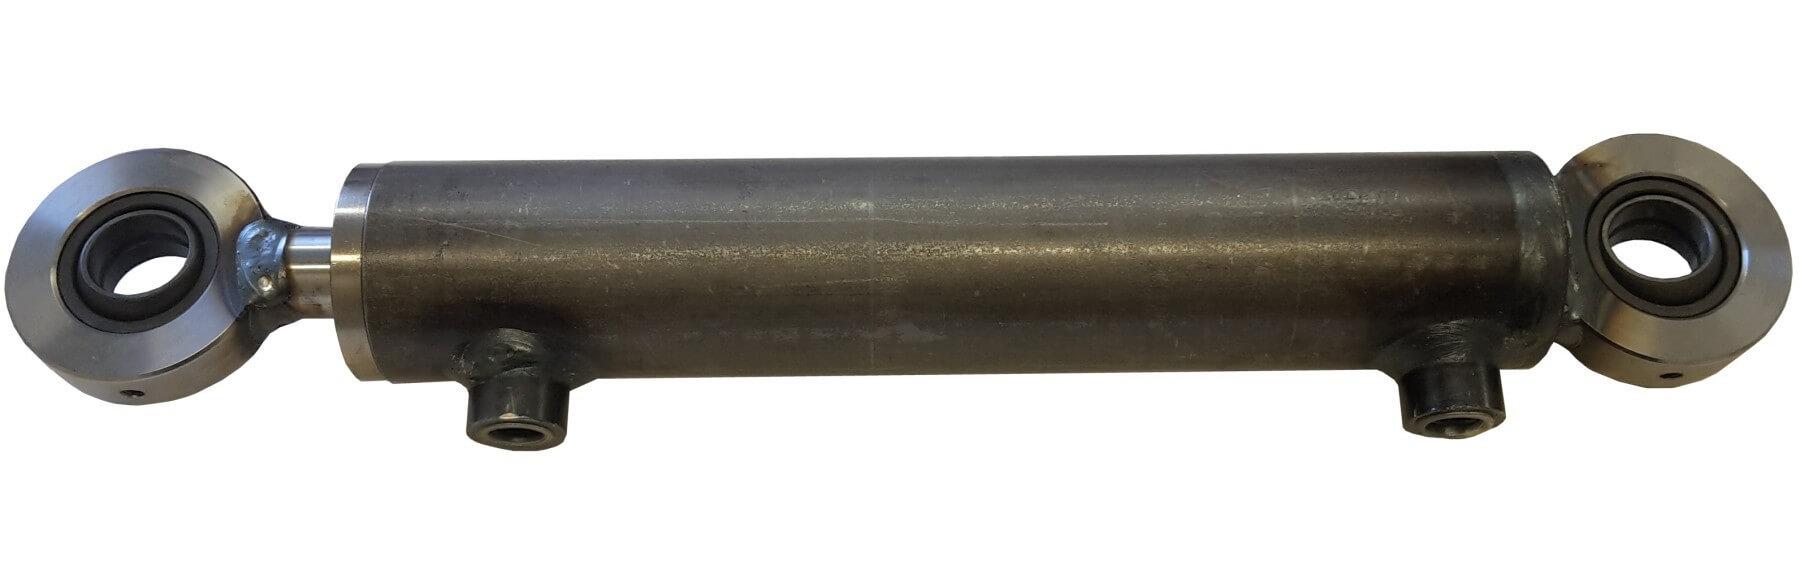 Hydraulisylinteri CL 50. 25. 150 GE